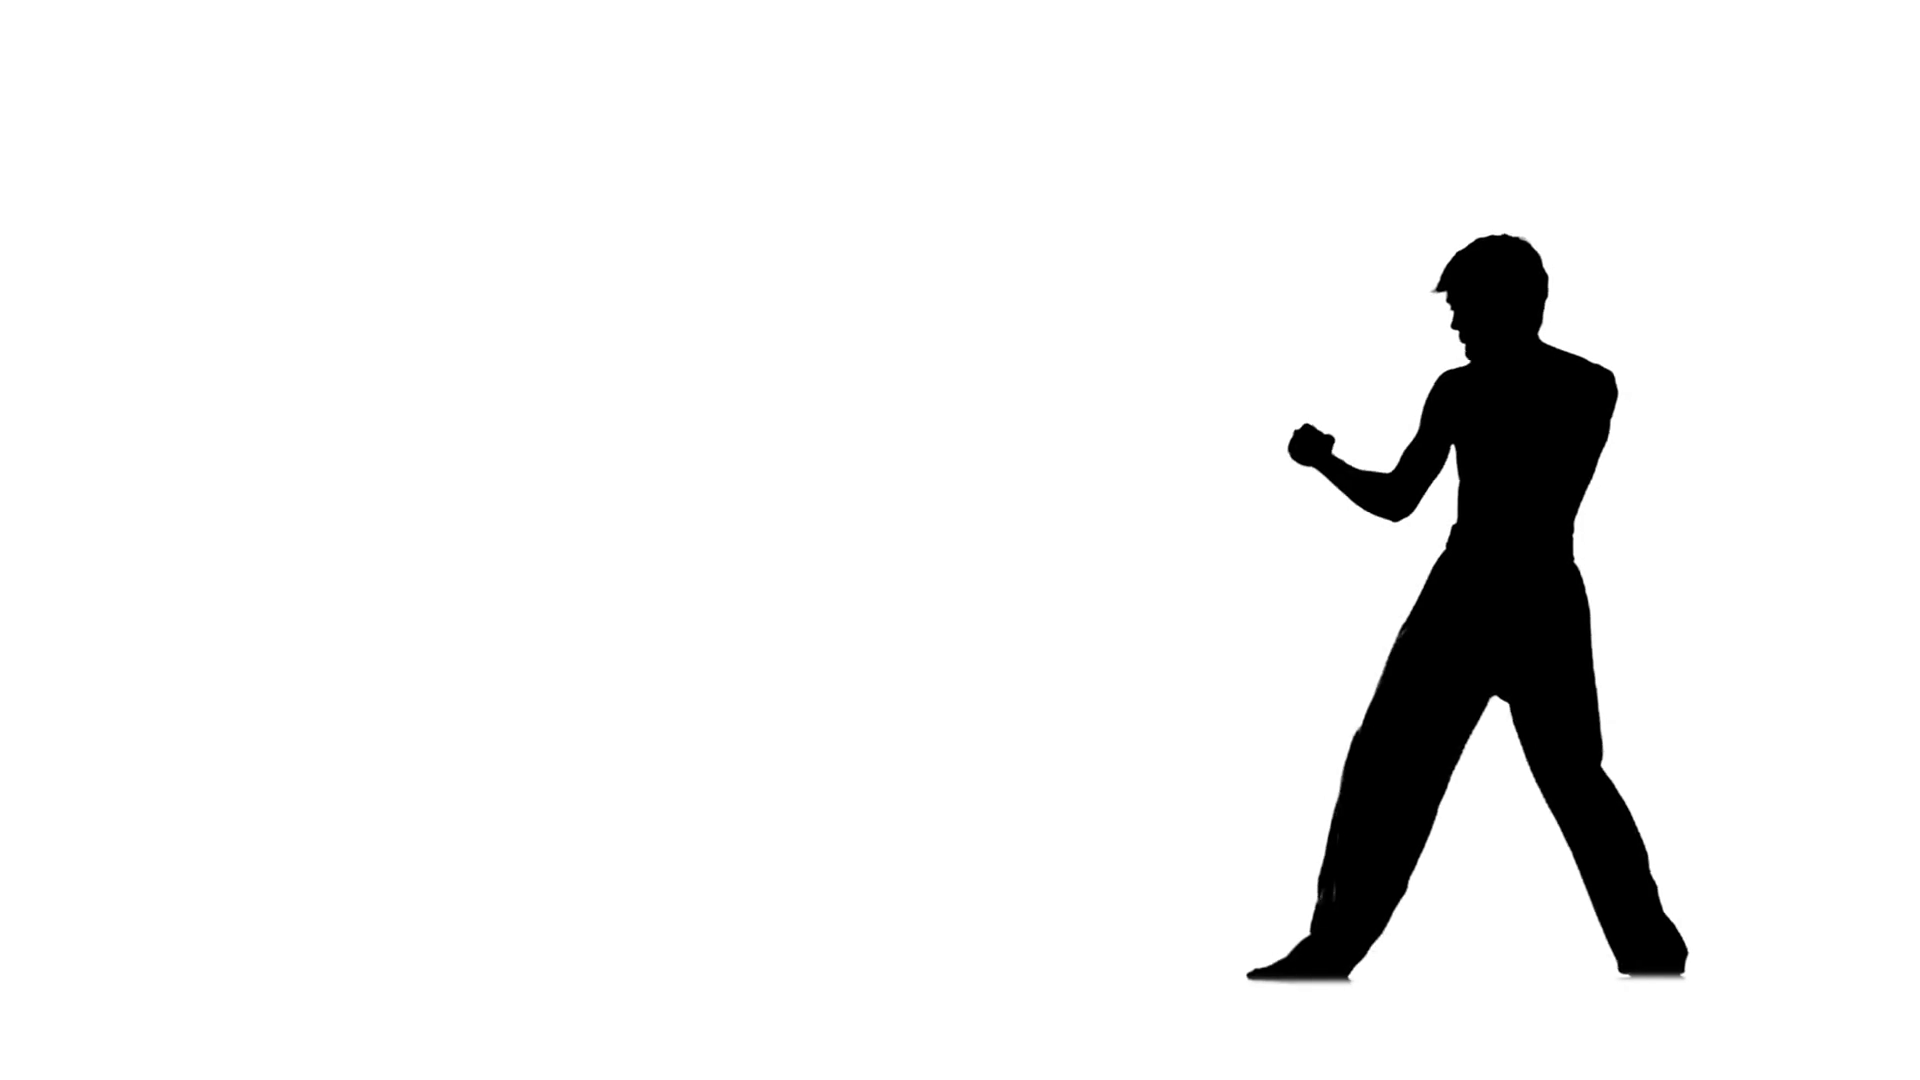 1920x1080 Man Training Taekwondo Or Karate Jumping, High Kick And Fist Punch